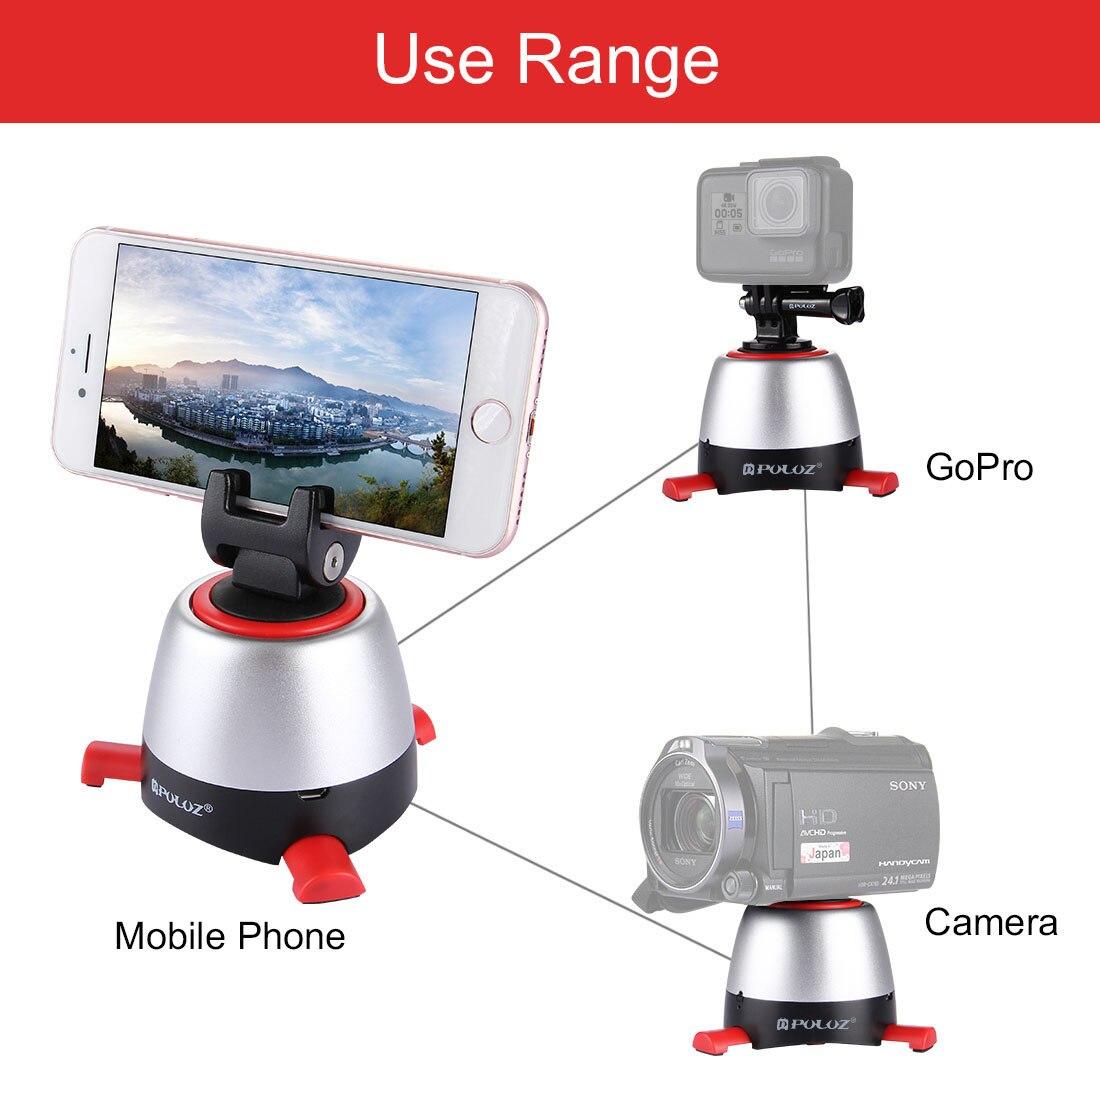 360 Degree Rotating Mini Electric Panorama Tripod Head with Phone Clip for Smartphones Gopro SJCAM Pocket SLR Camera